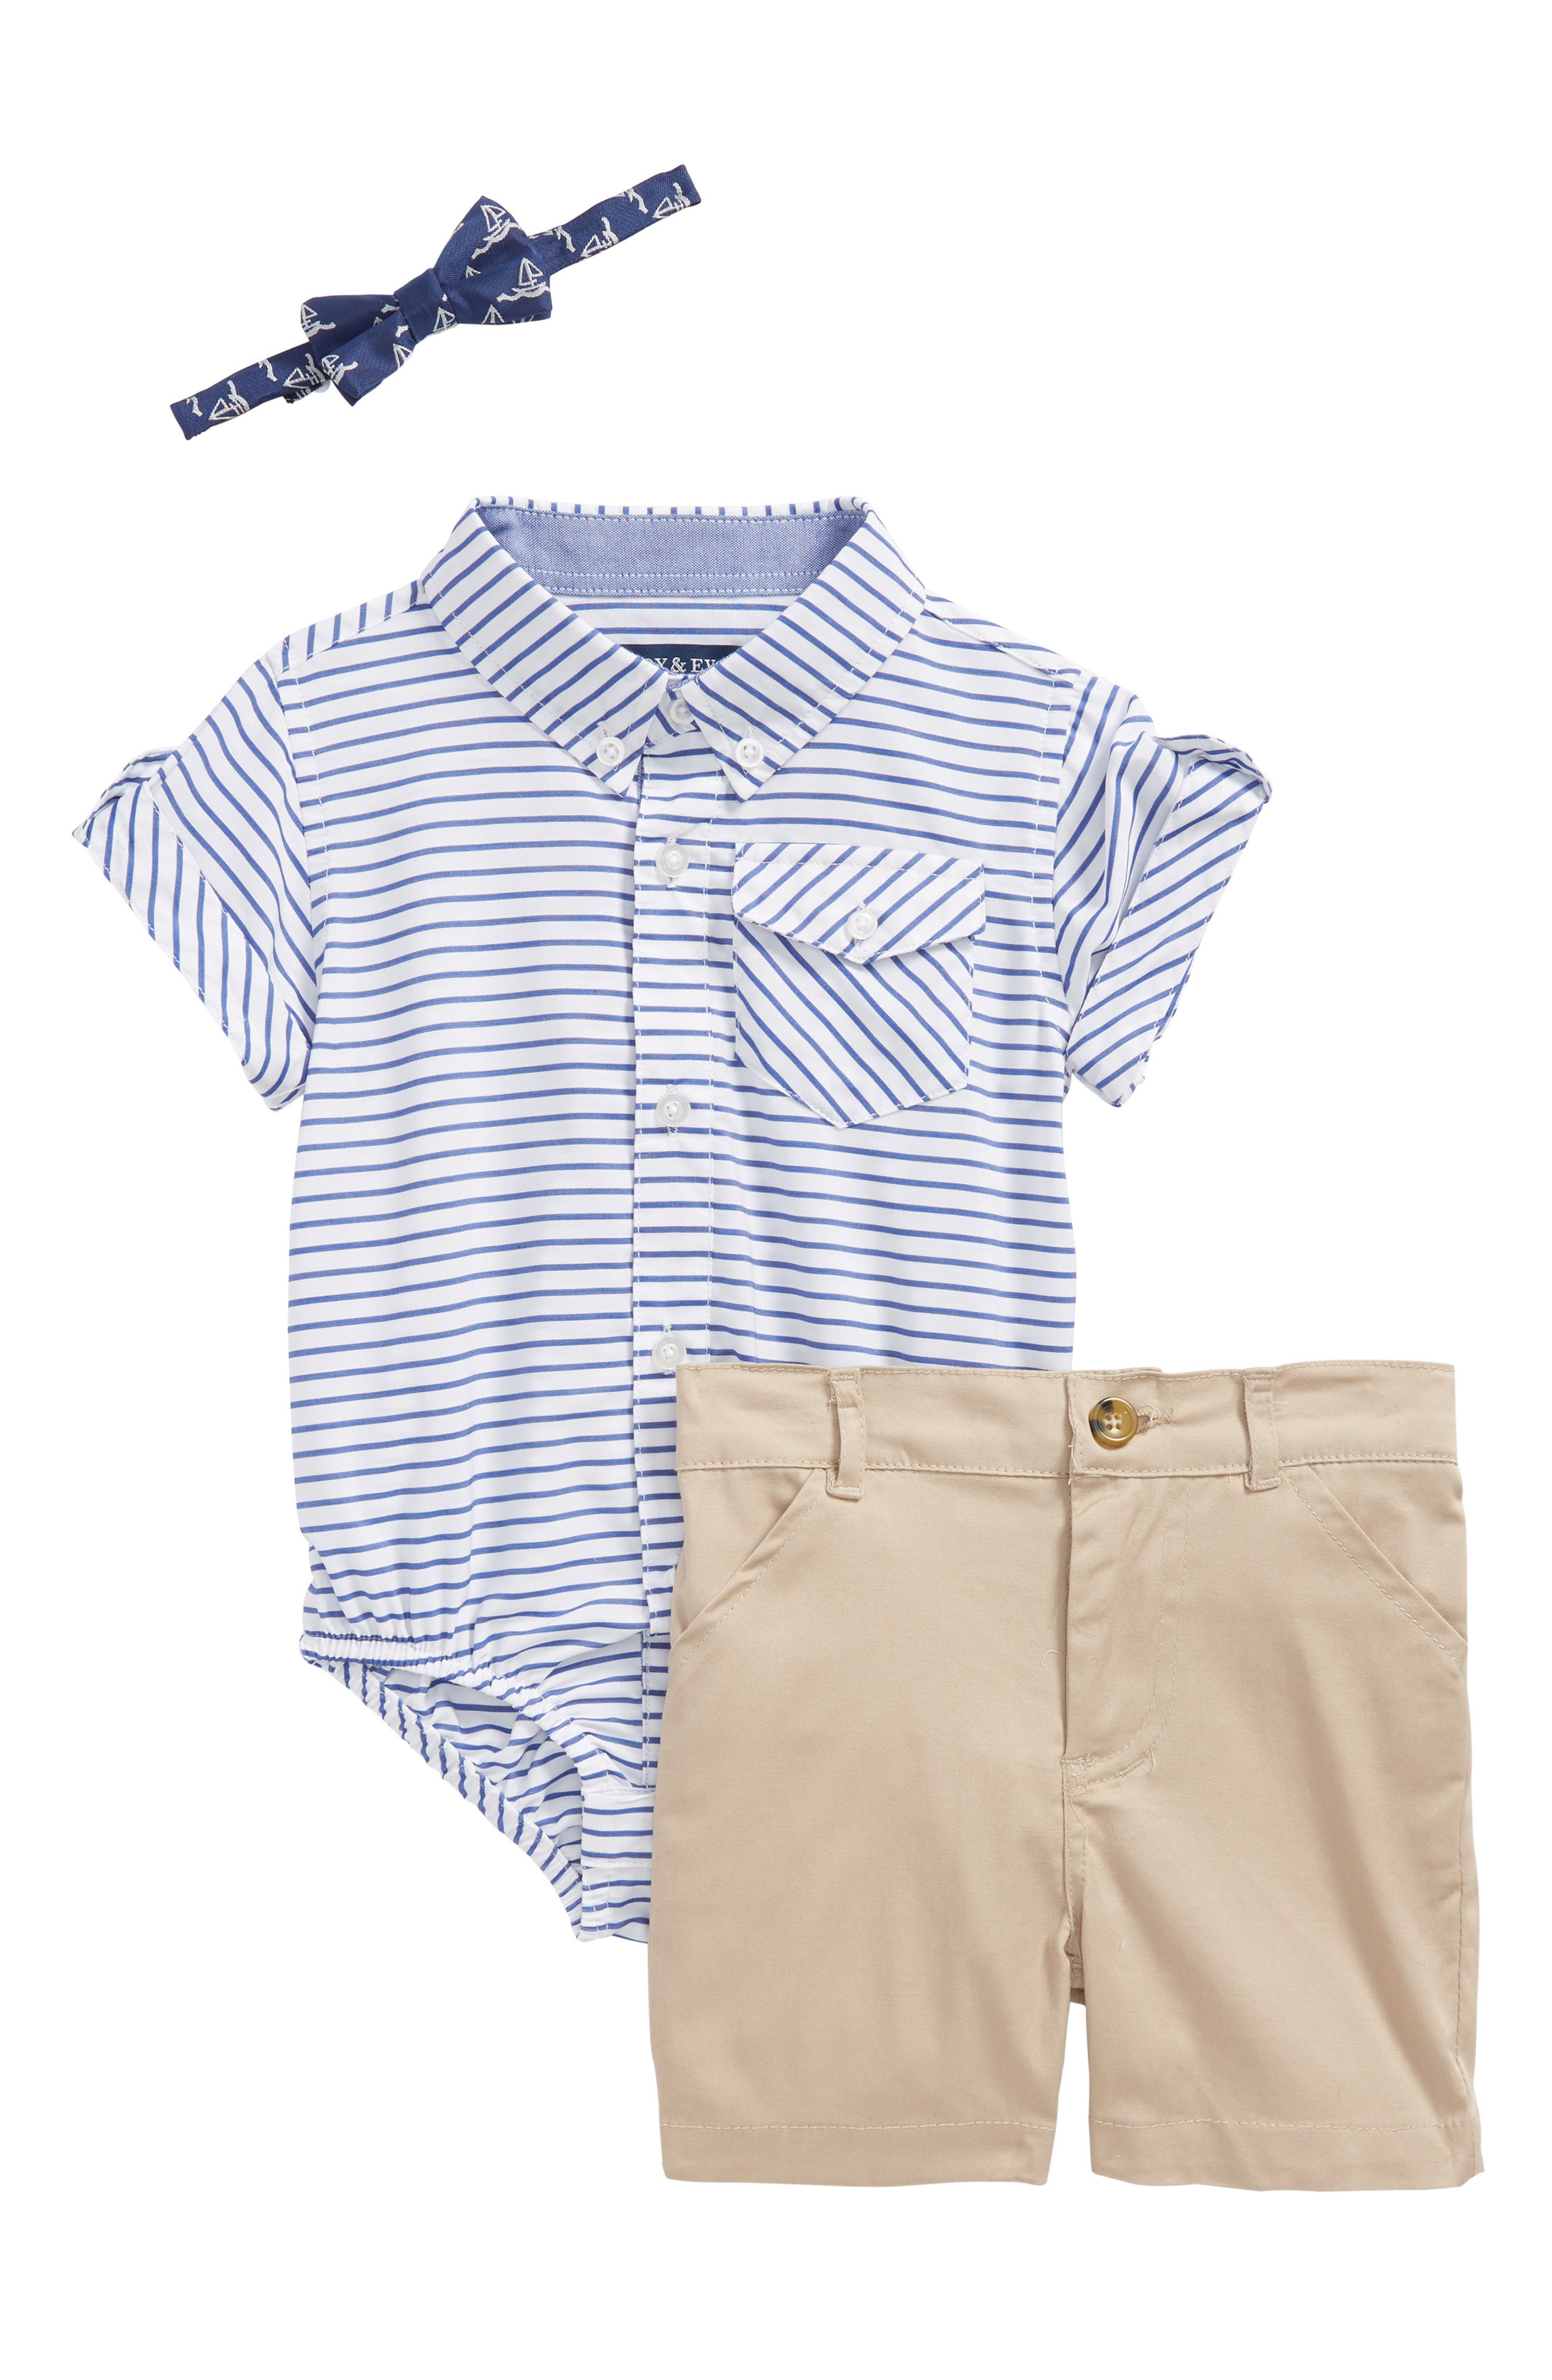 ANDY & EVAN, Shirtzie, Bow Tie & Shorts Set, Main thumbnail 1, color, BLUE